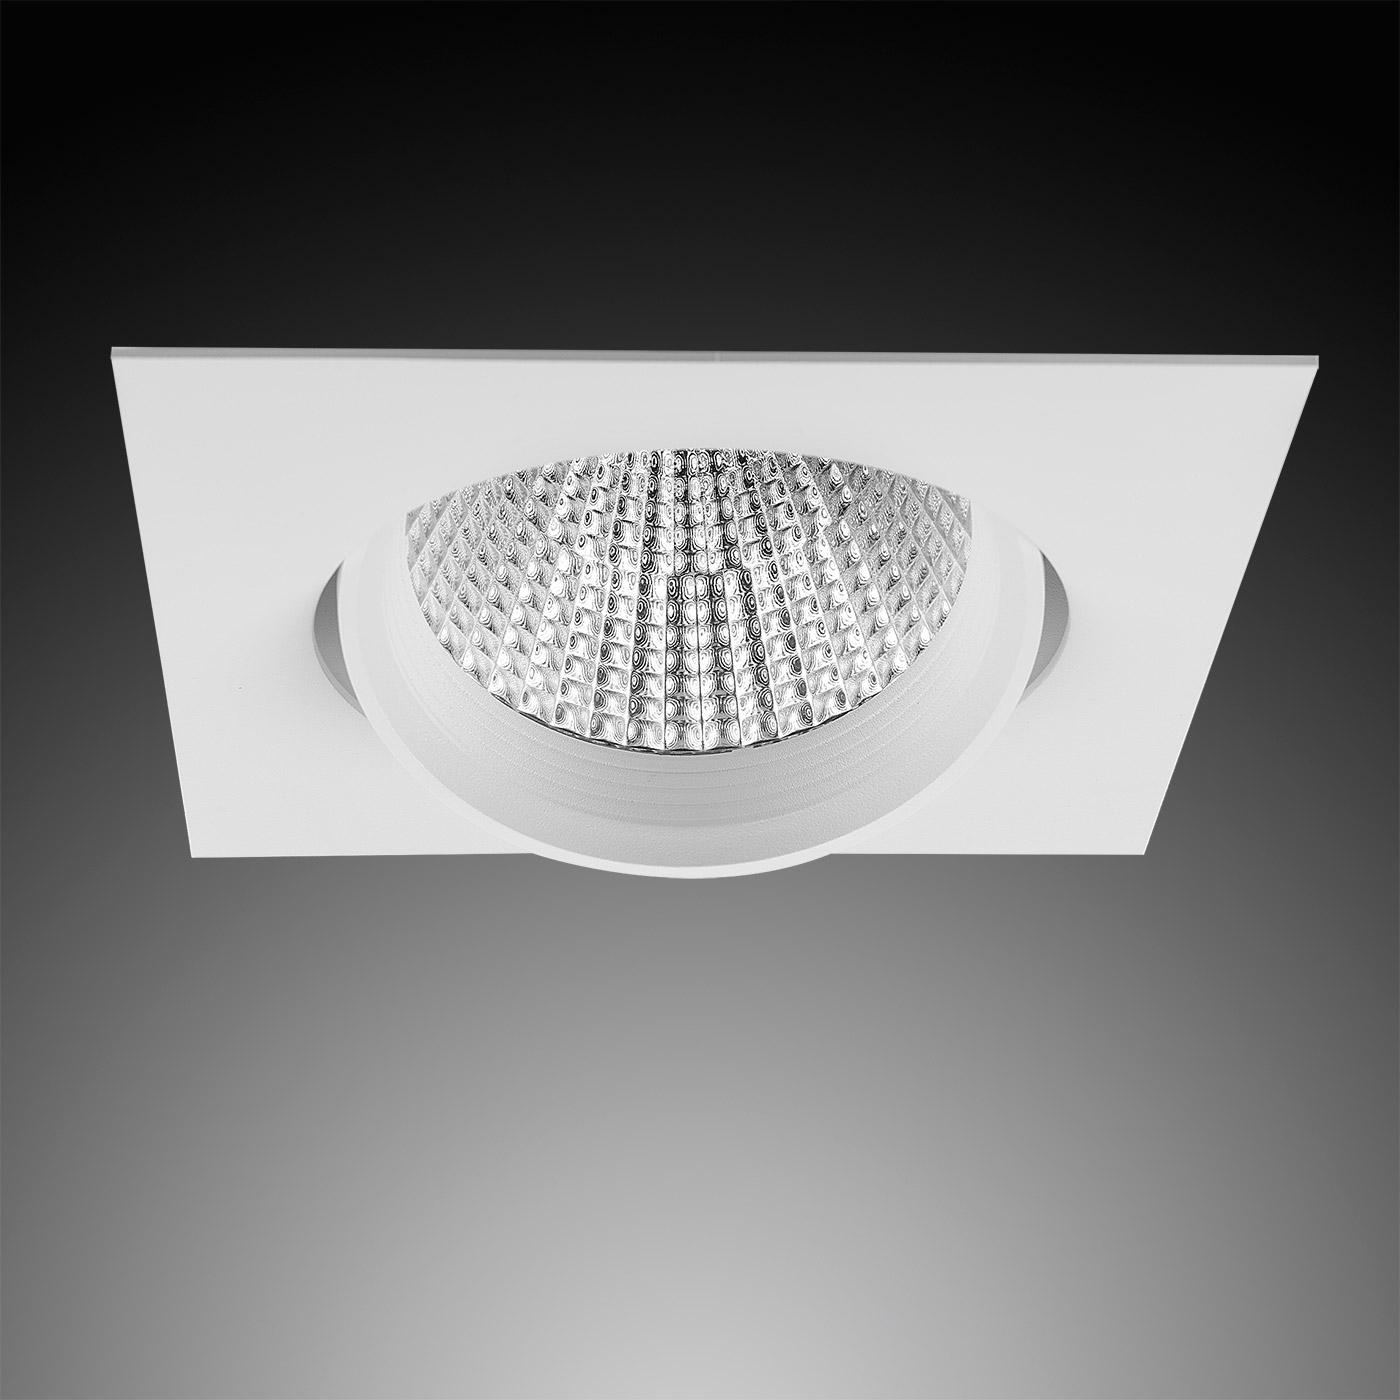 SILVER | LAMP83 - Effiziente Beleuchtungssysteme